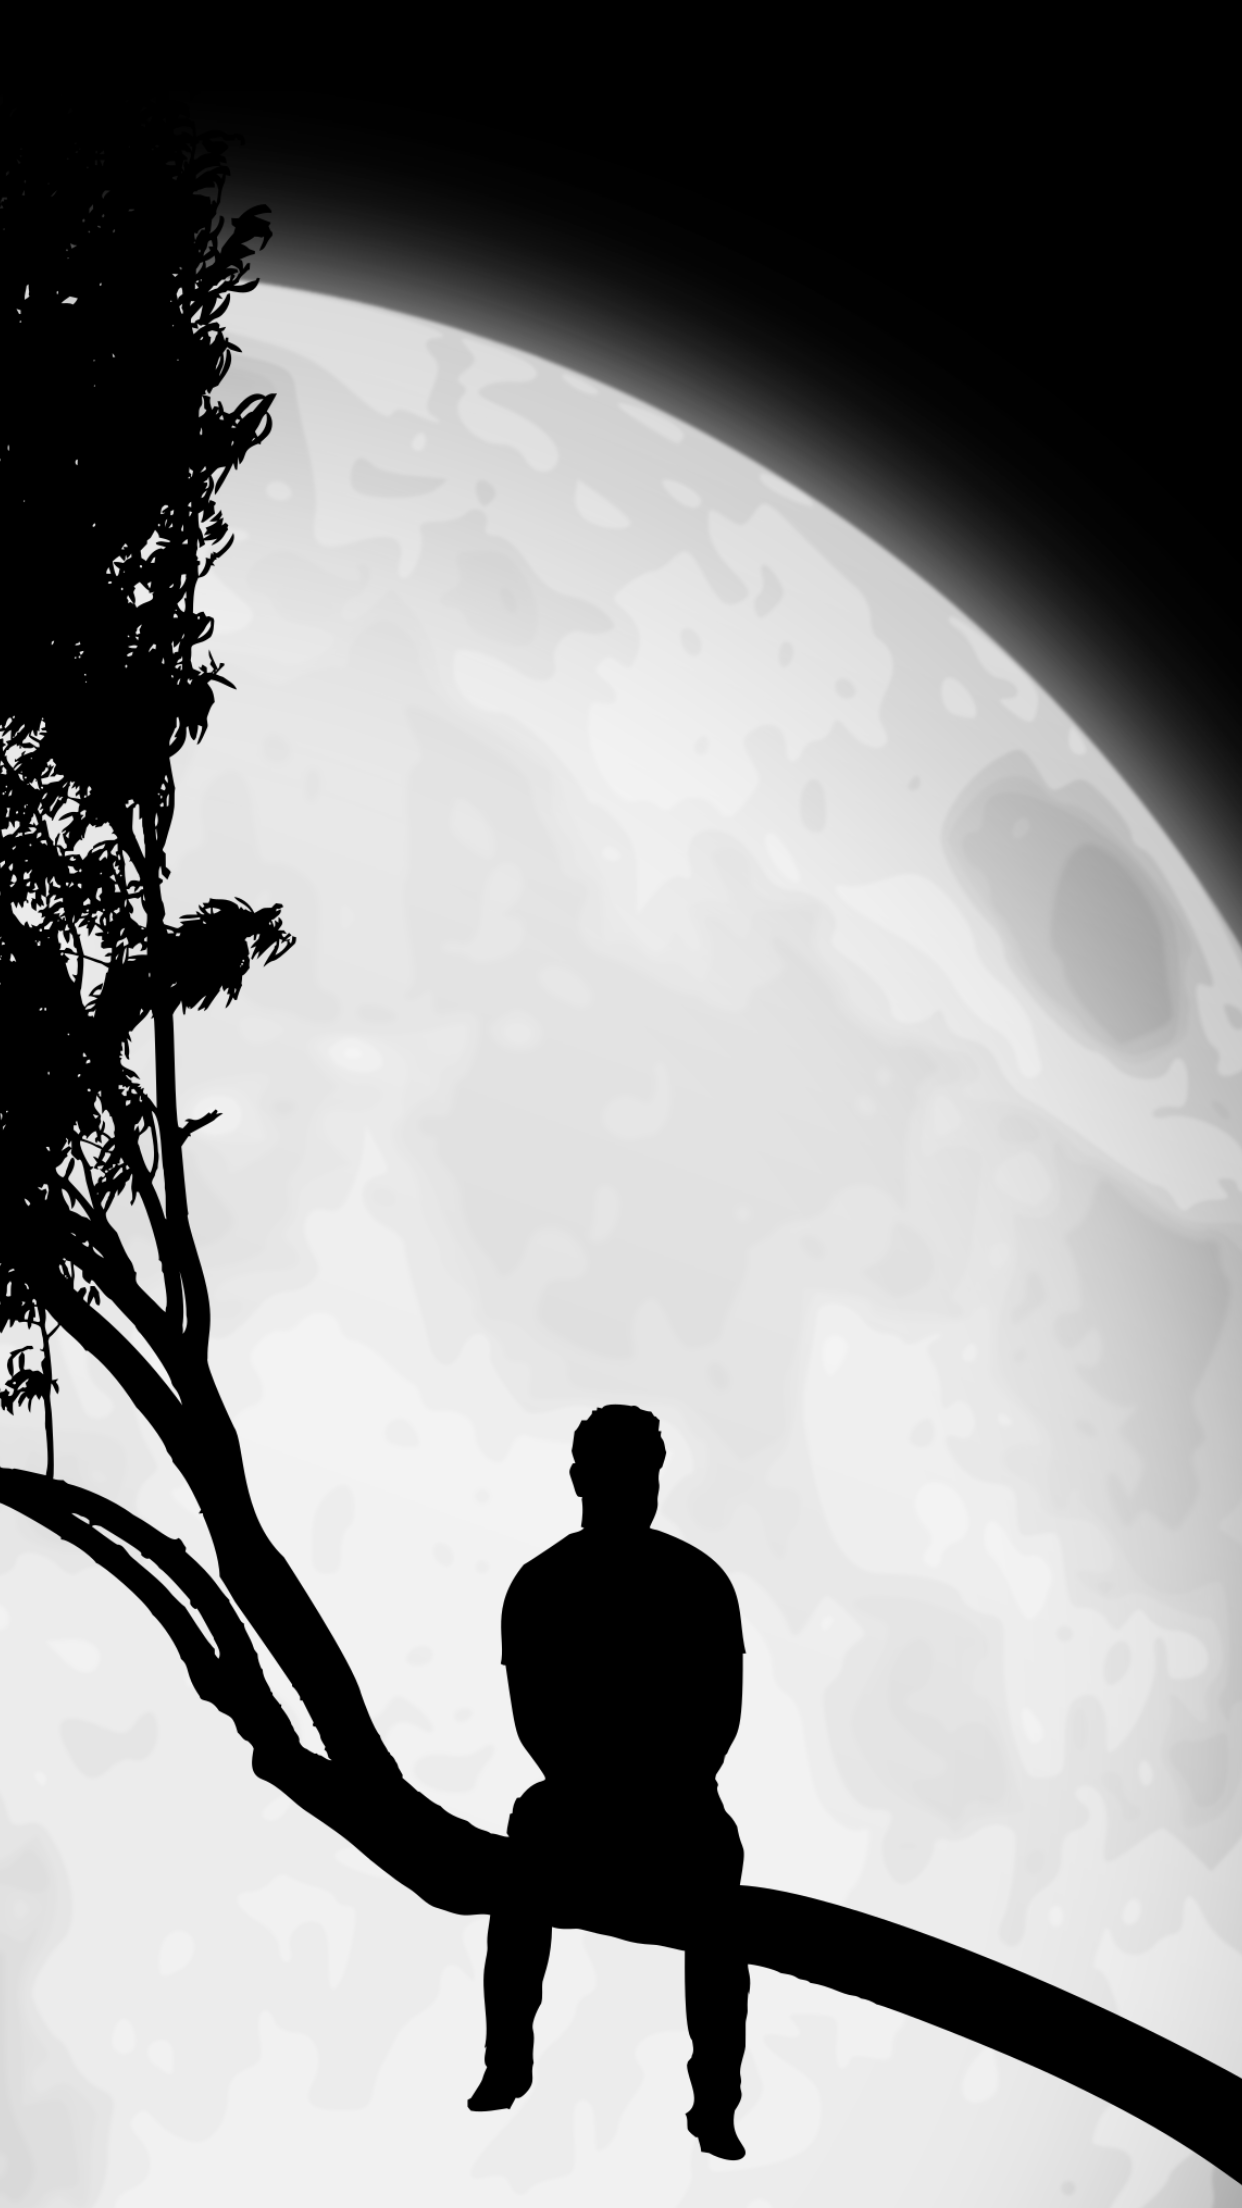 Alone with moon alone man alone girl alone boy wallpaper boys wallpaper